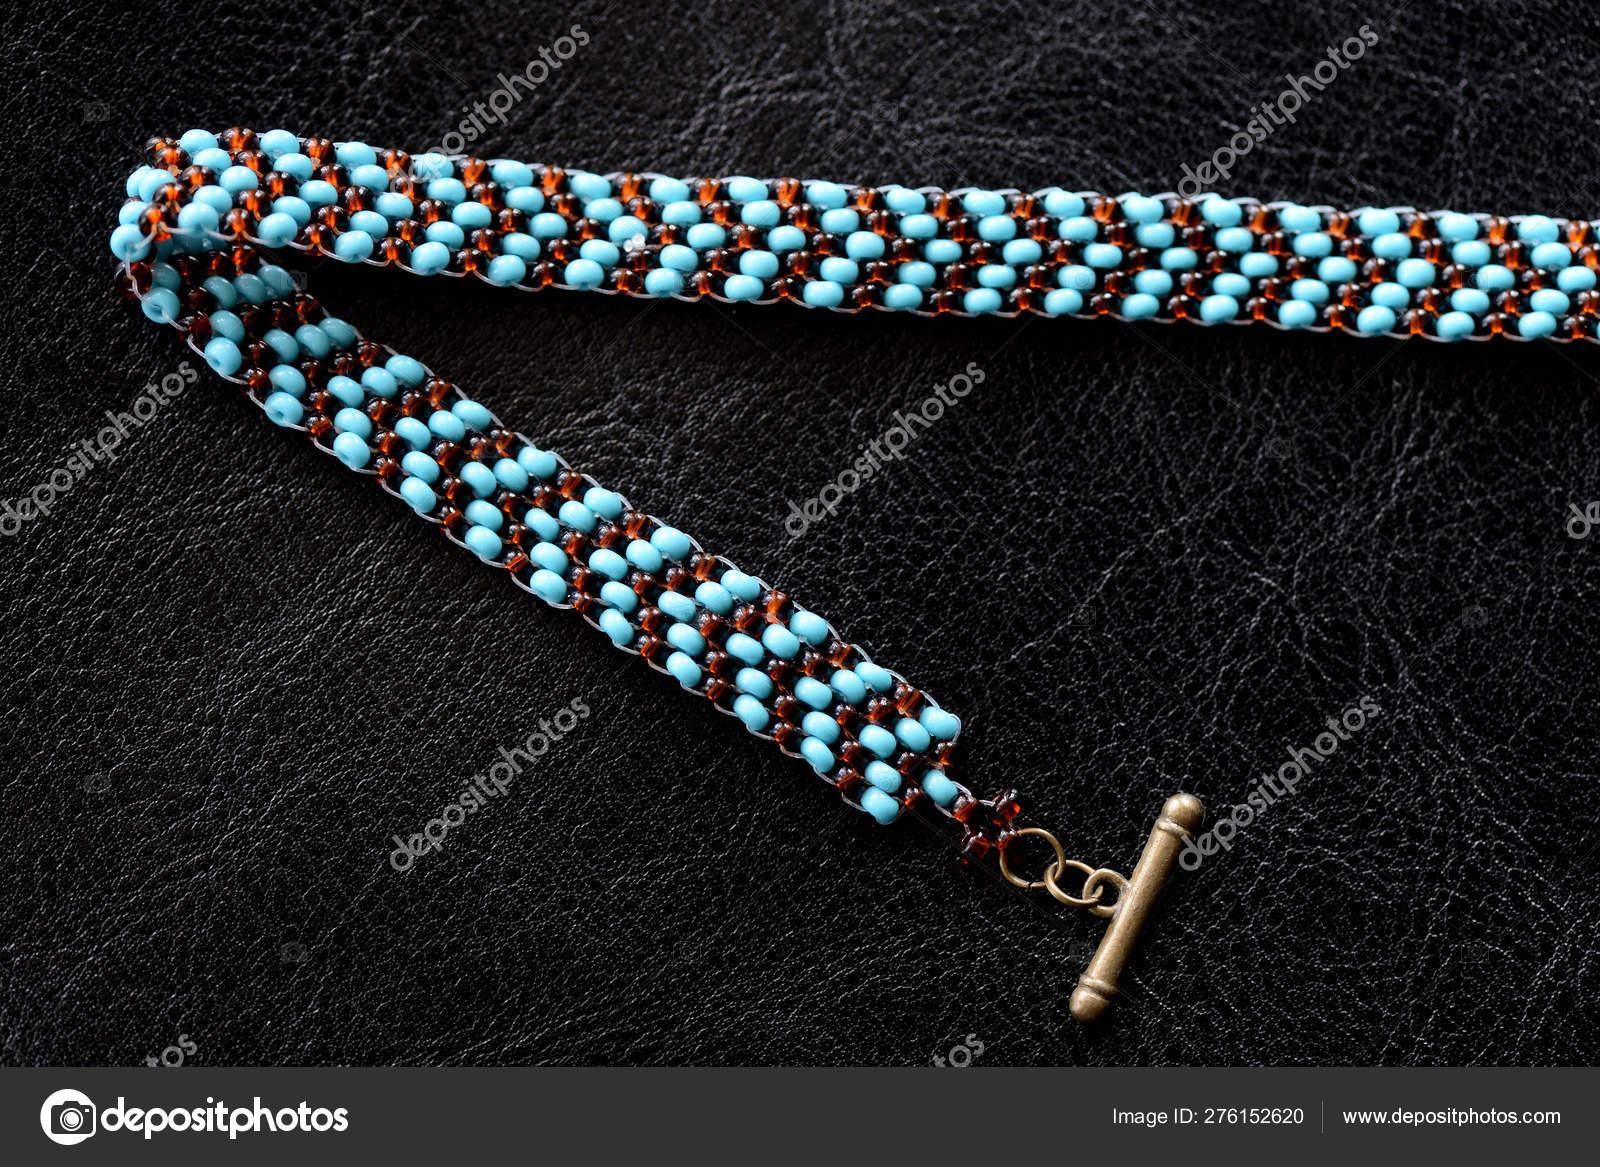 Peyote Choker Necklace Made Seed Beads Dark Background Close Stock Photo C Tallula 276152620